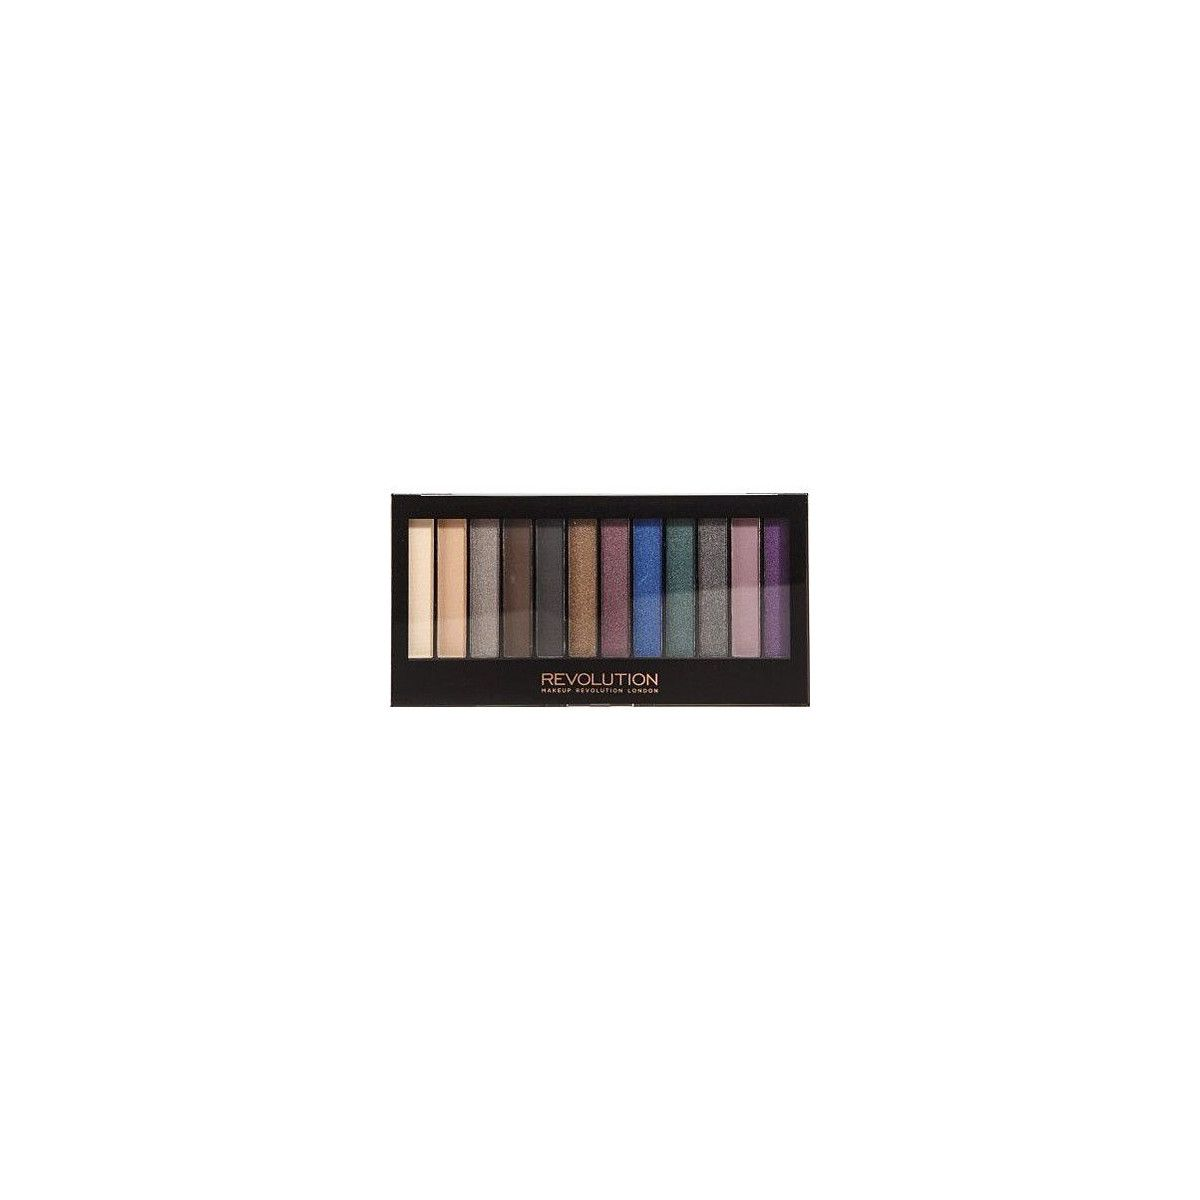 Makeup Revolution Redemption Palette Hot Smoked, 12 cieni do powiek intensywne kolory 14g